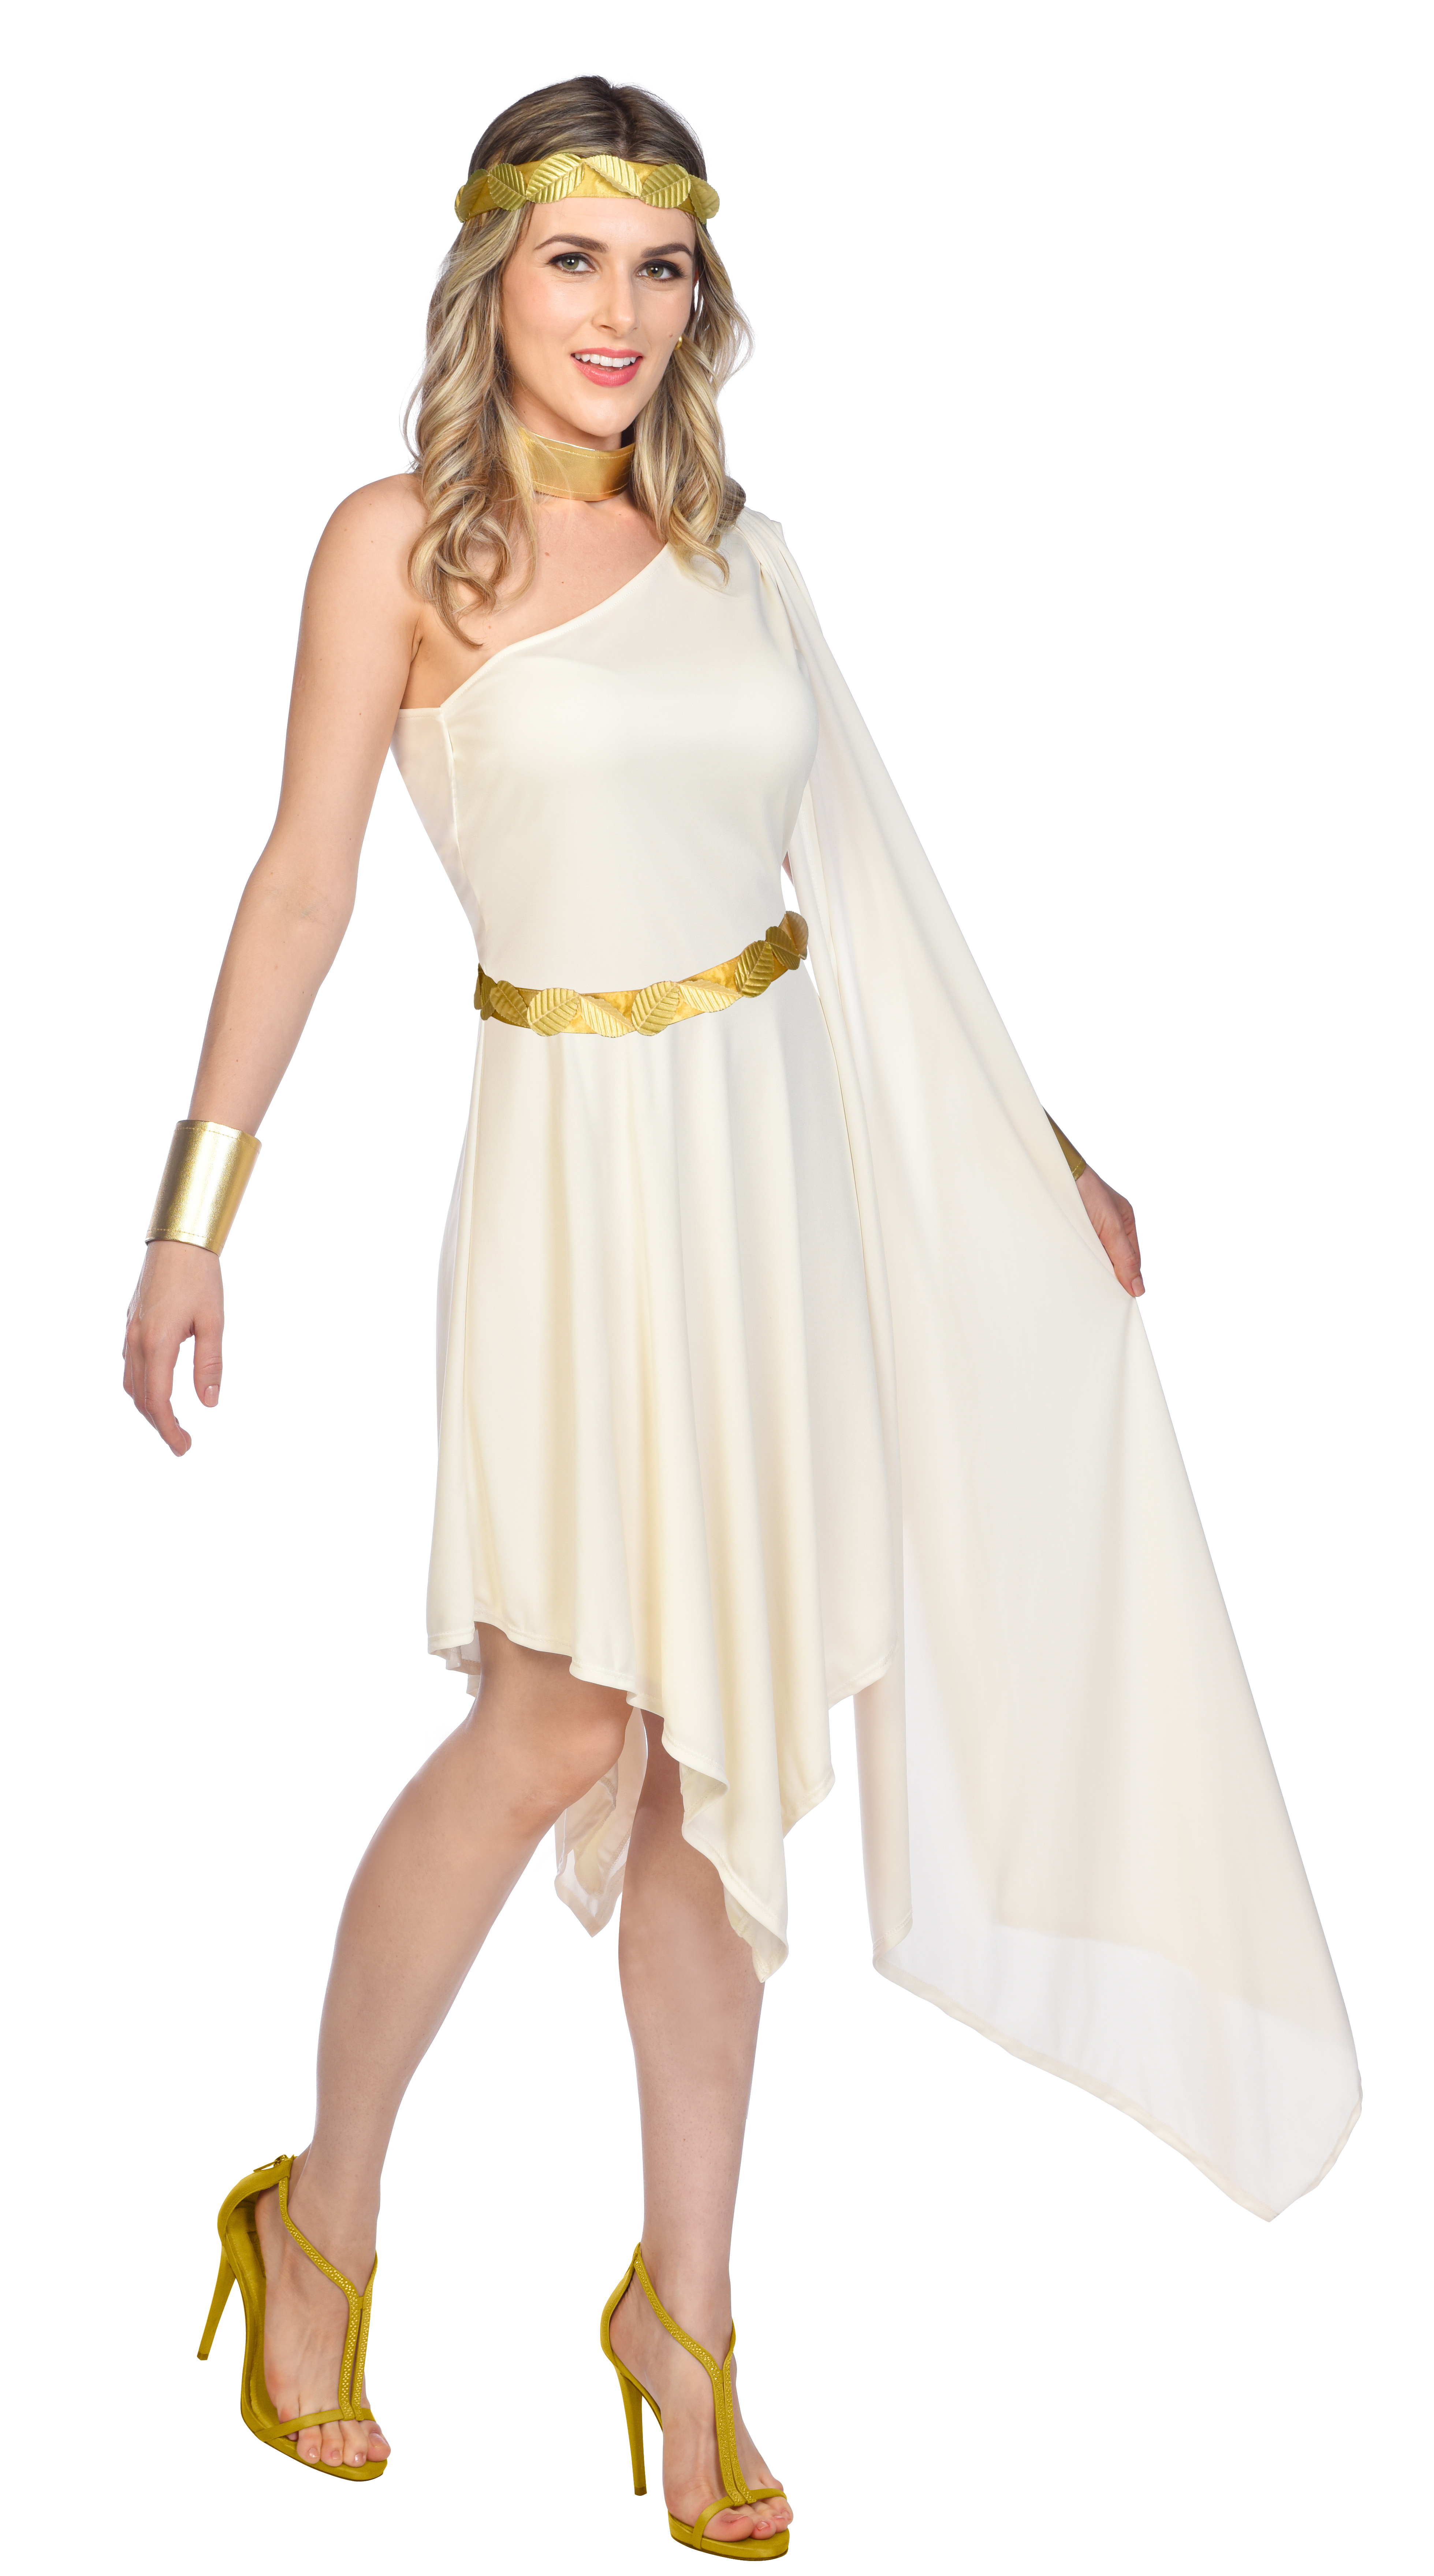 Indexbild 9 - Adult Ladies Golden Goddess Gladiator Greek Roman Toga Fancy Dress Costume New